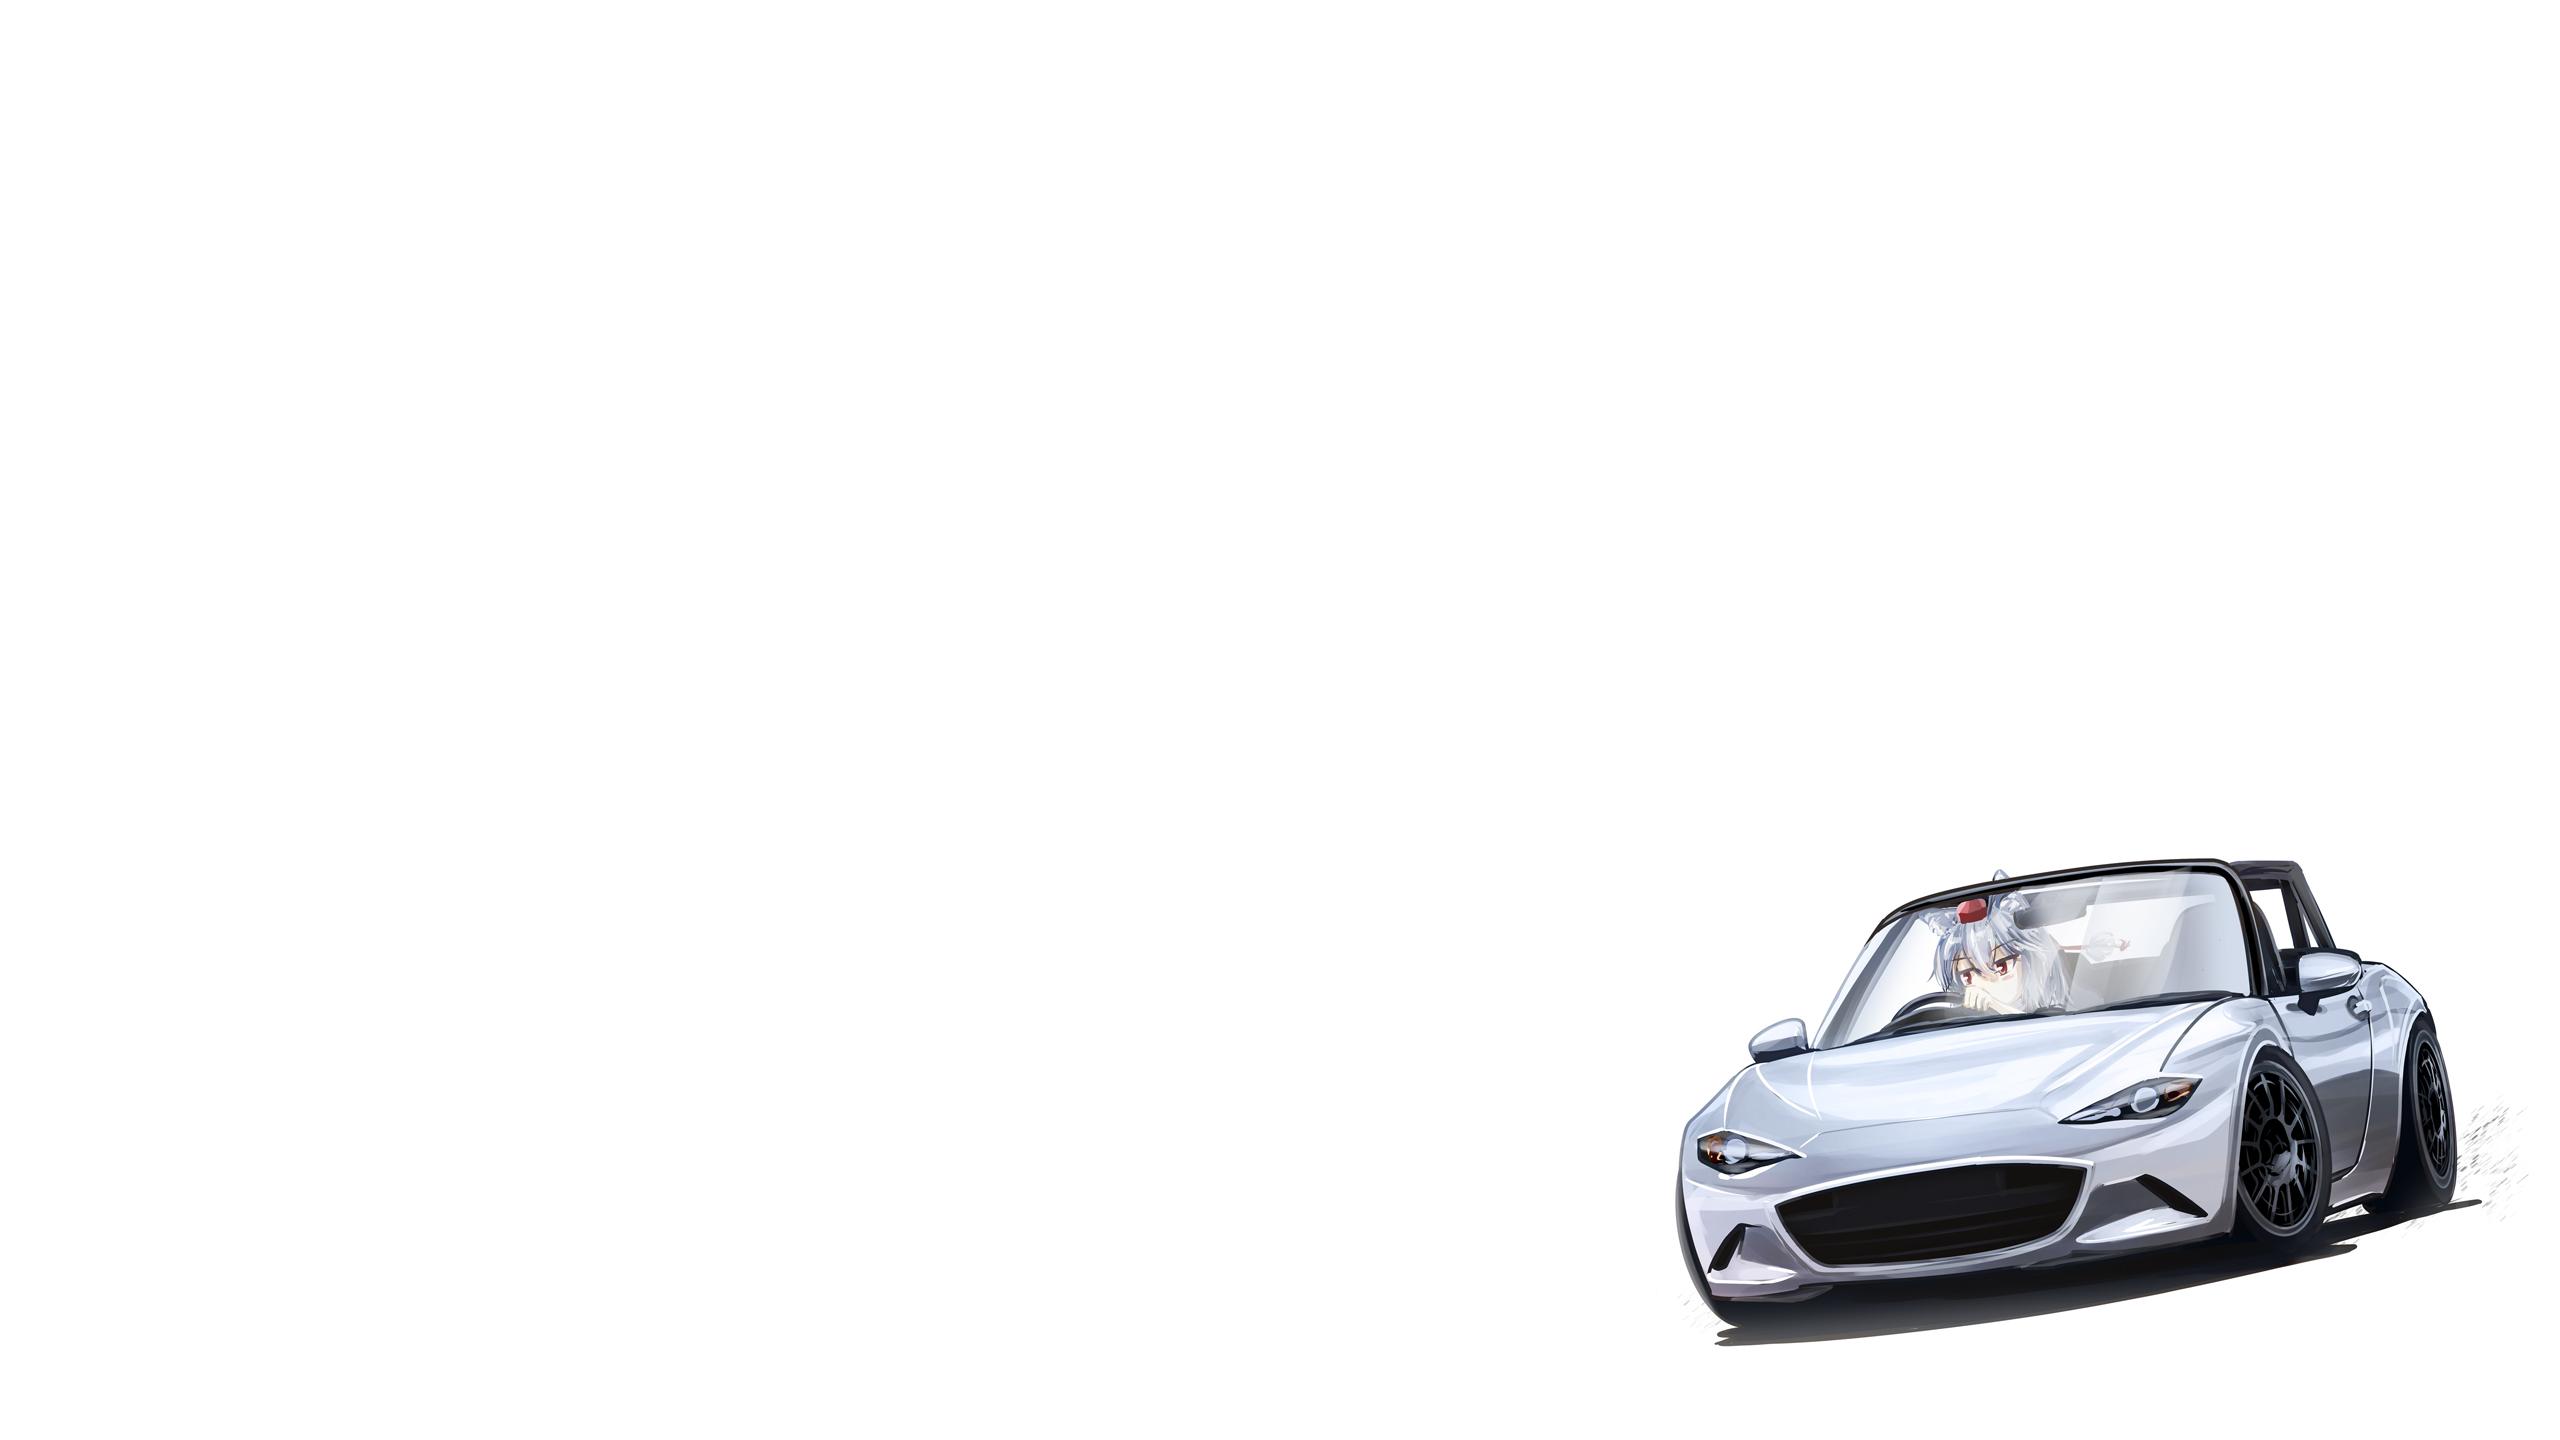 Fond D Ecran Mazda Mx 5 Voiture Touhou Inubashiri Momiji Fond Blanc Minimalisme Filles Anime 2560x1440 Nadeshiko 1921789 Fond D Ecran Wallhere